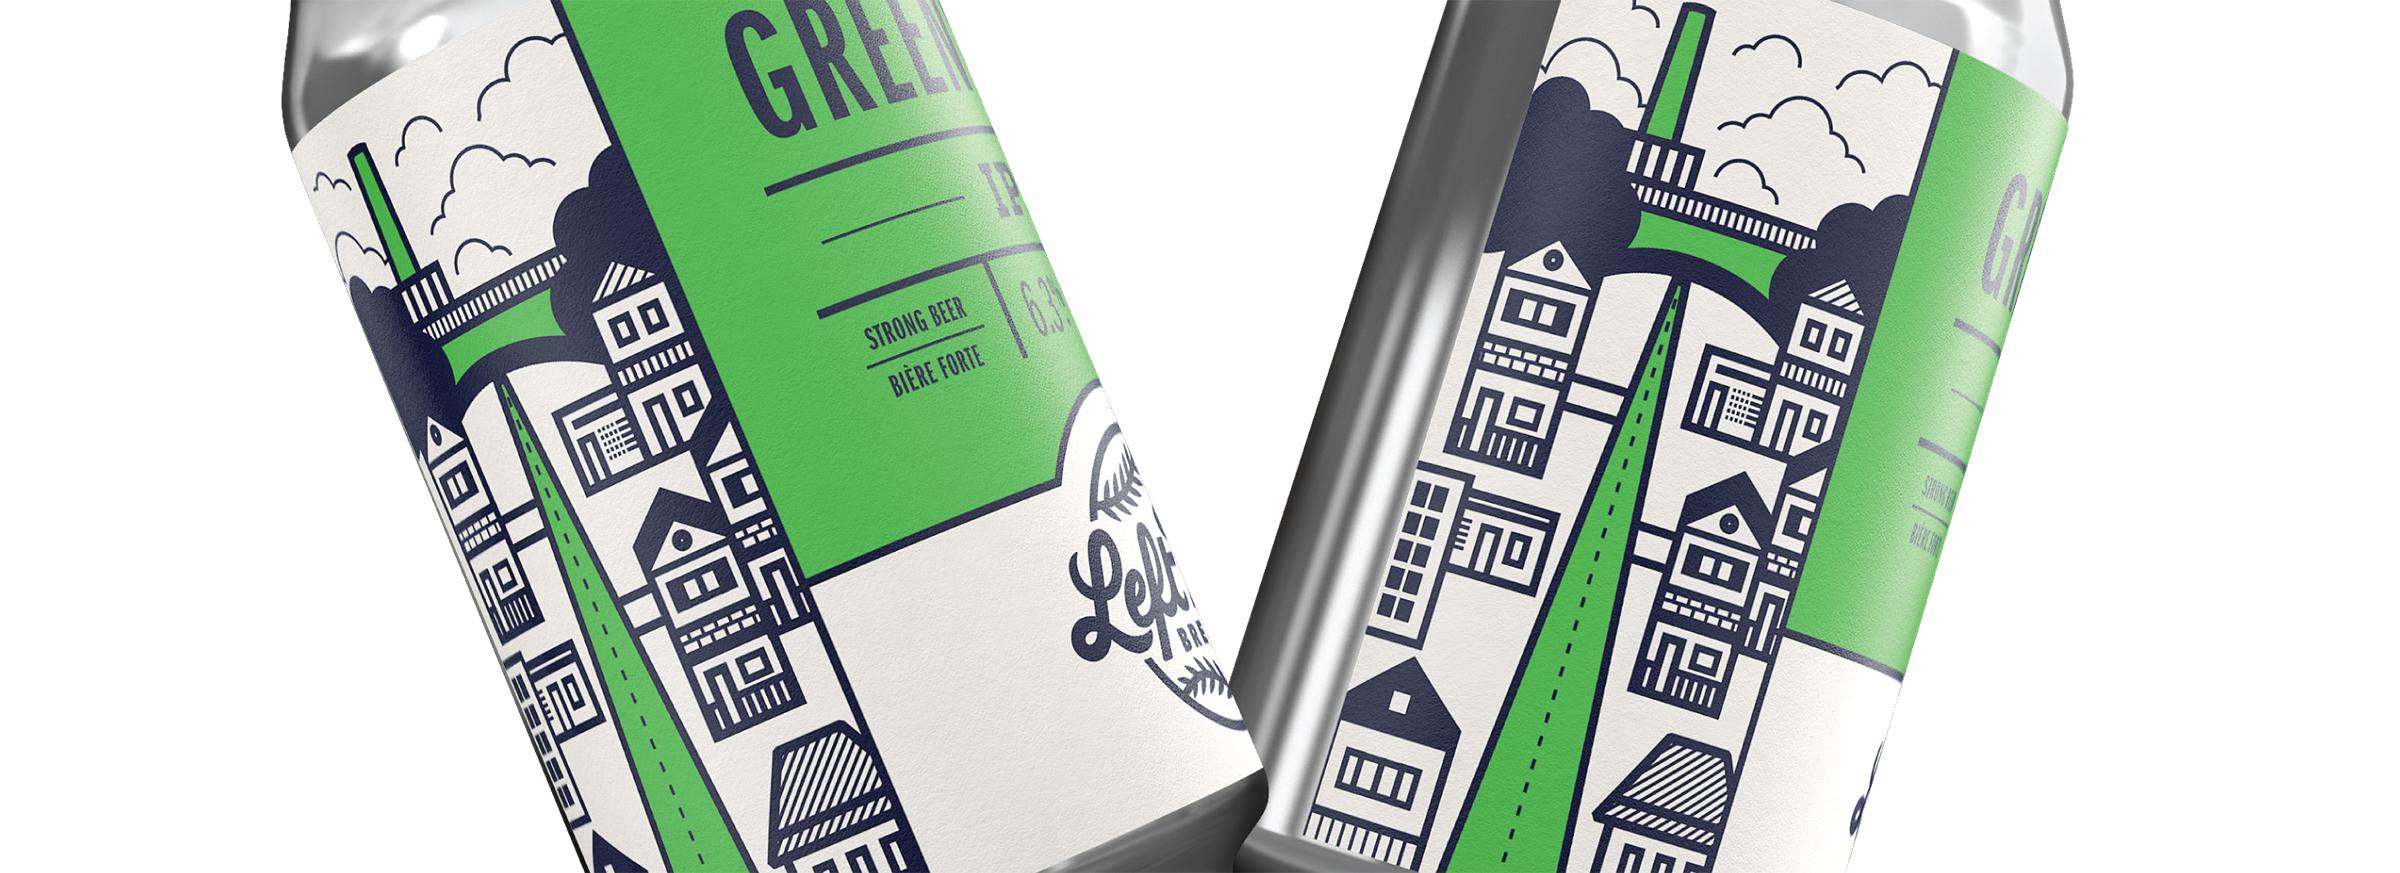 CODO Design - Left Field Brewery12.jpg